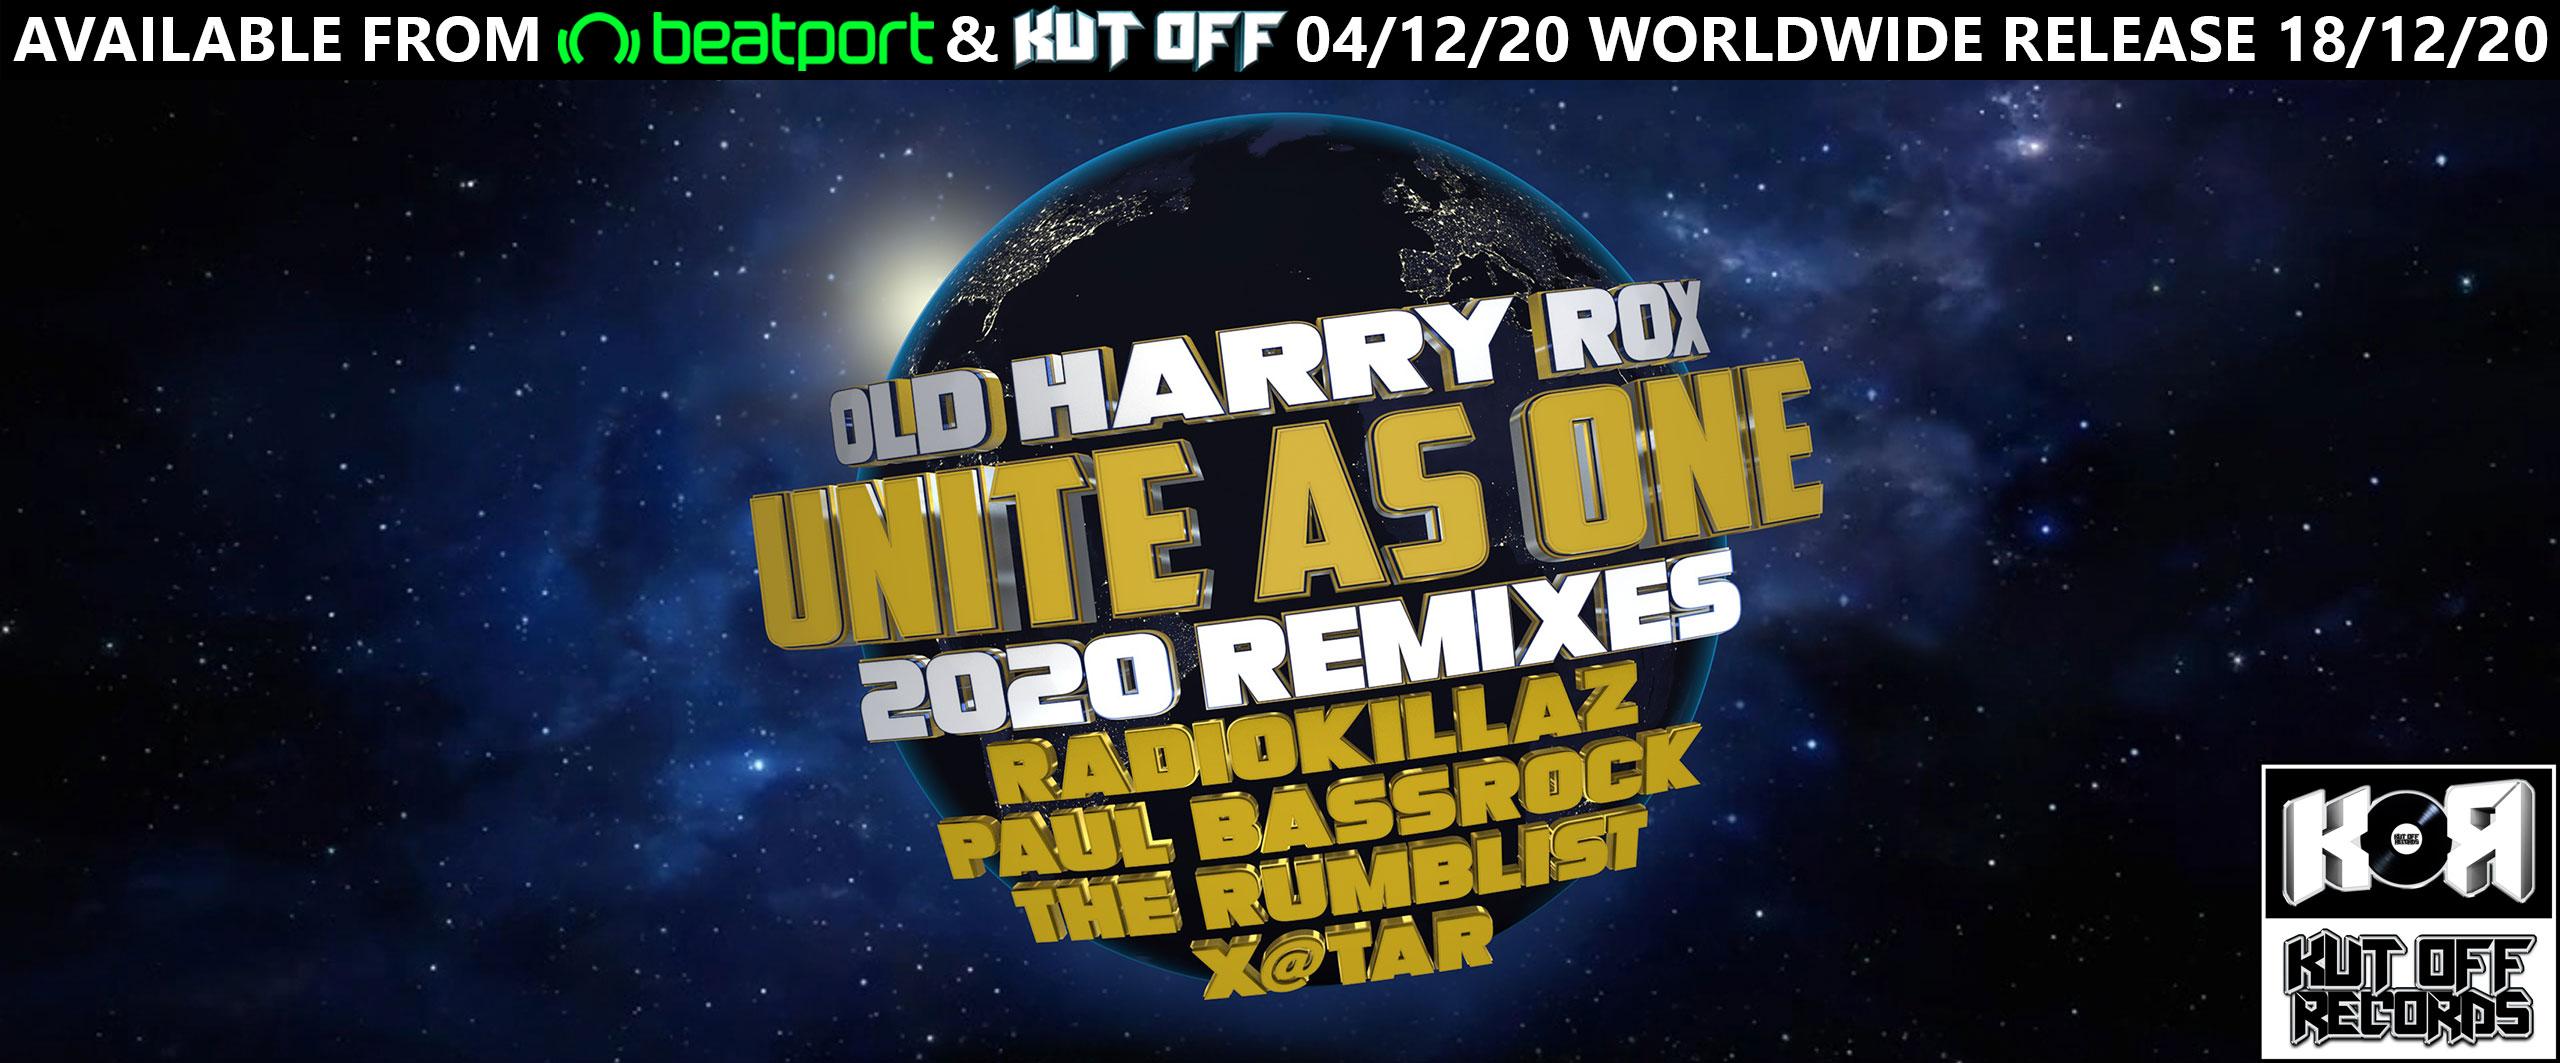 [](https://www.kutoffrecords.com/products/old-harry-rox-slash-unite-as-one-2020-remix-ep-slash-kor038)